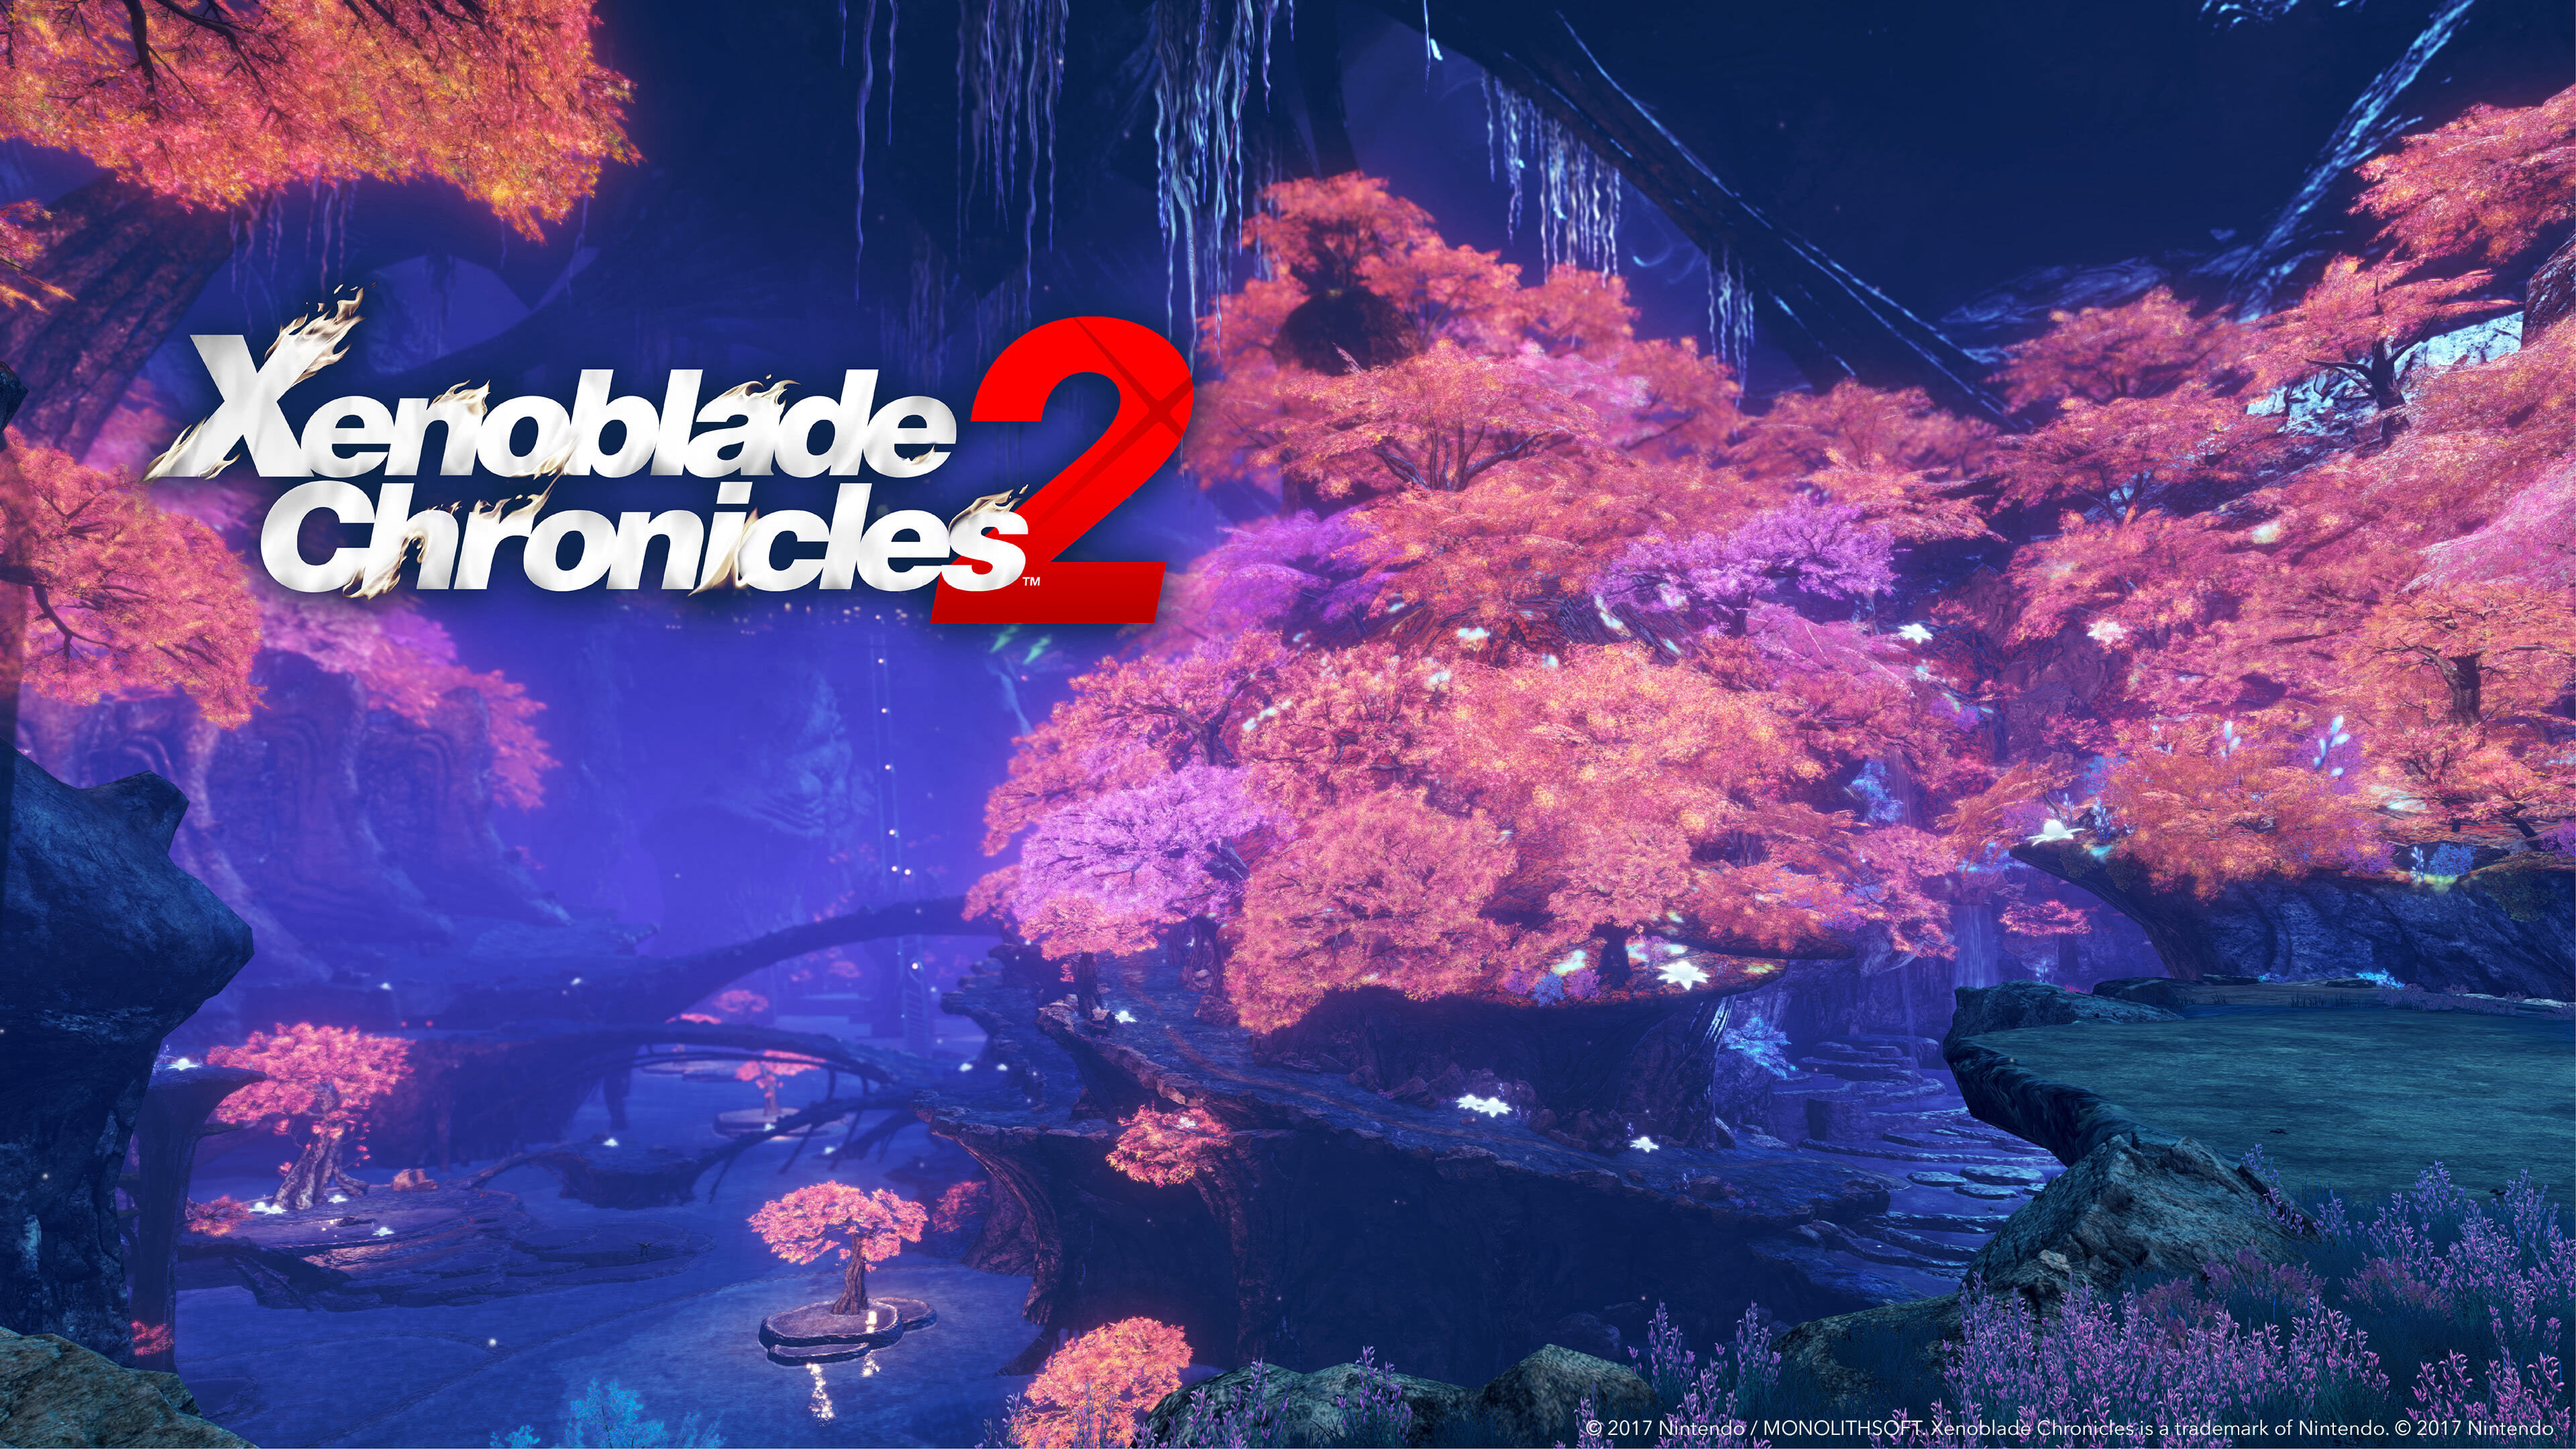 Xenoblade Chronicles 2 Kingdom Of Uraya UHD 4K Wallpaper Pixelz 3840x2160